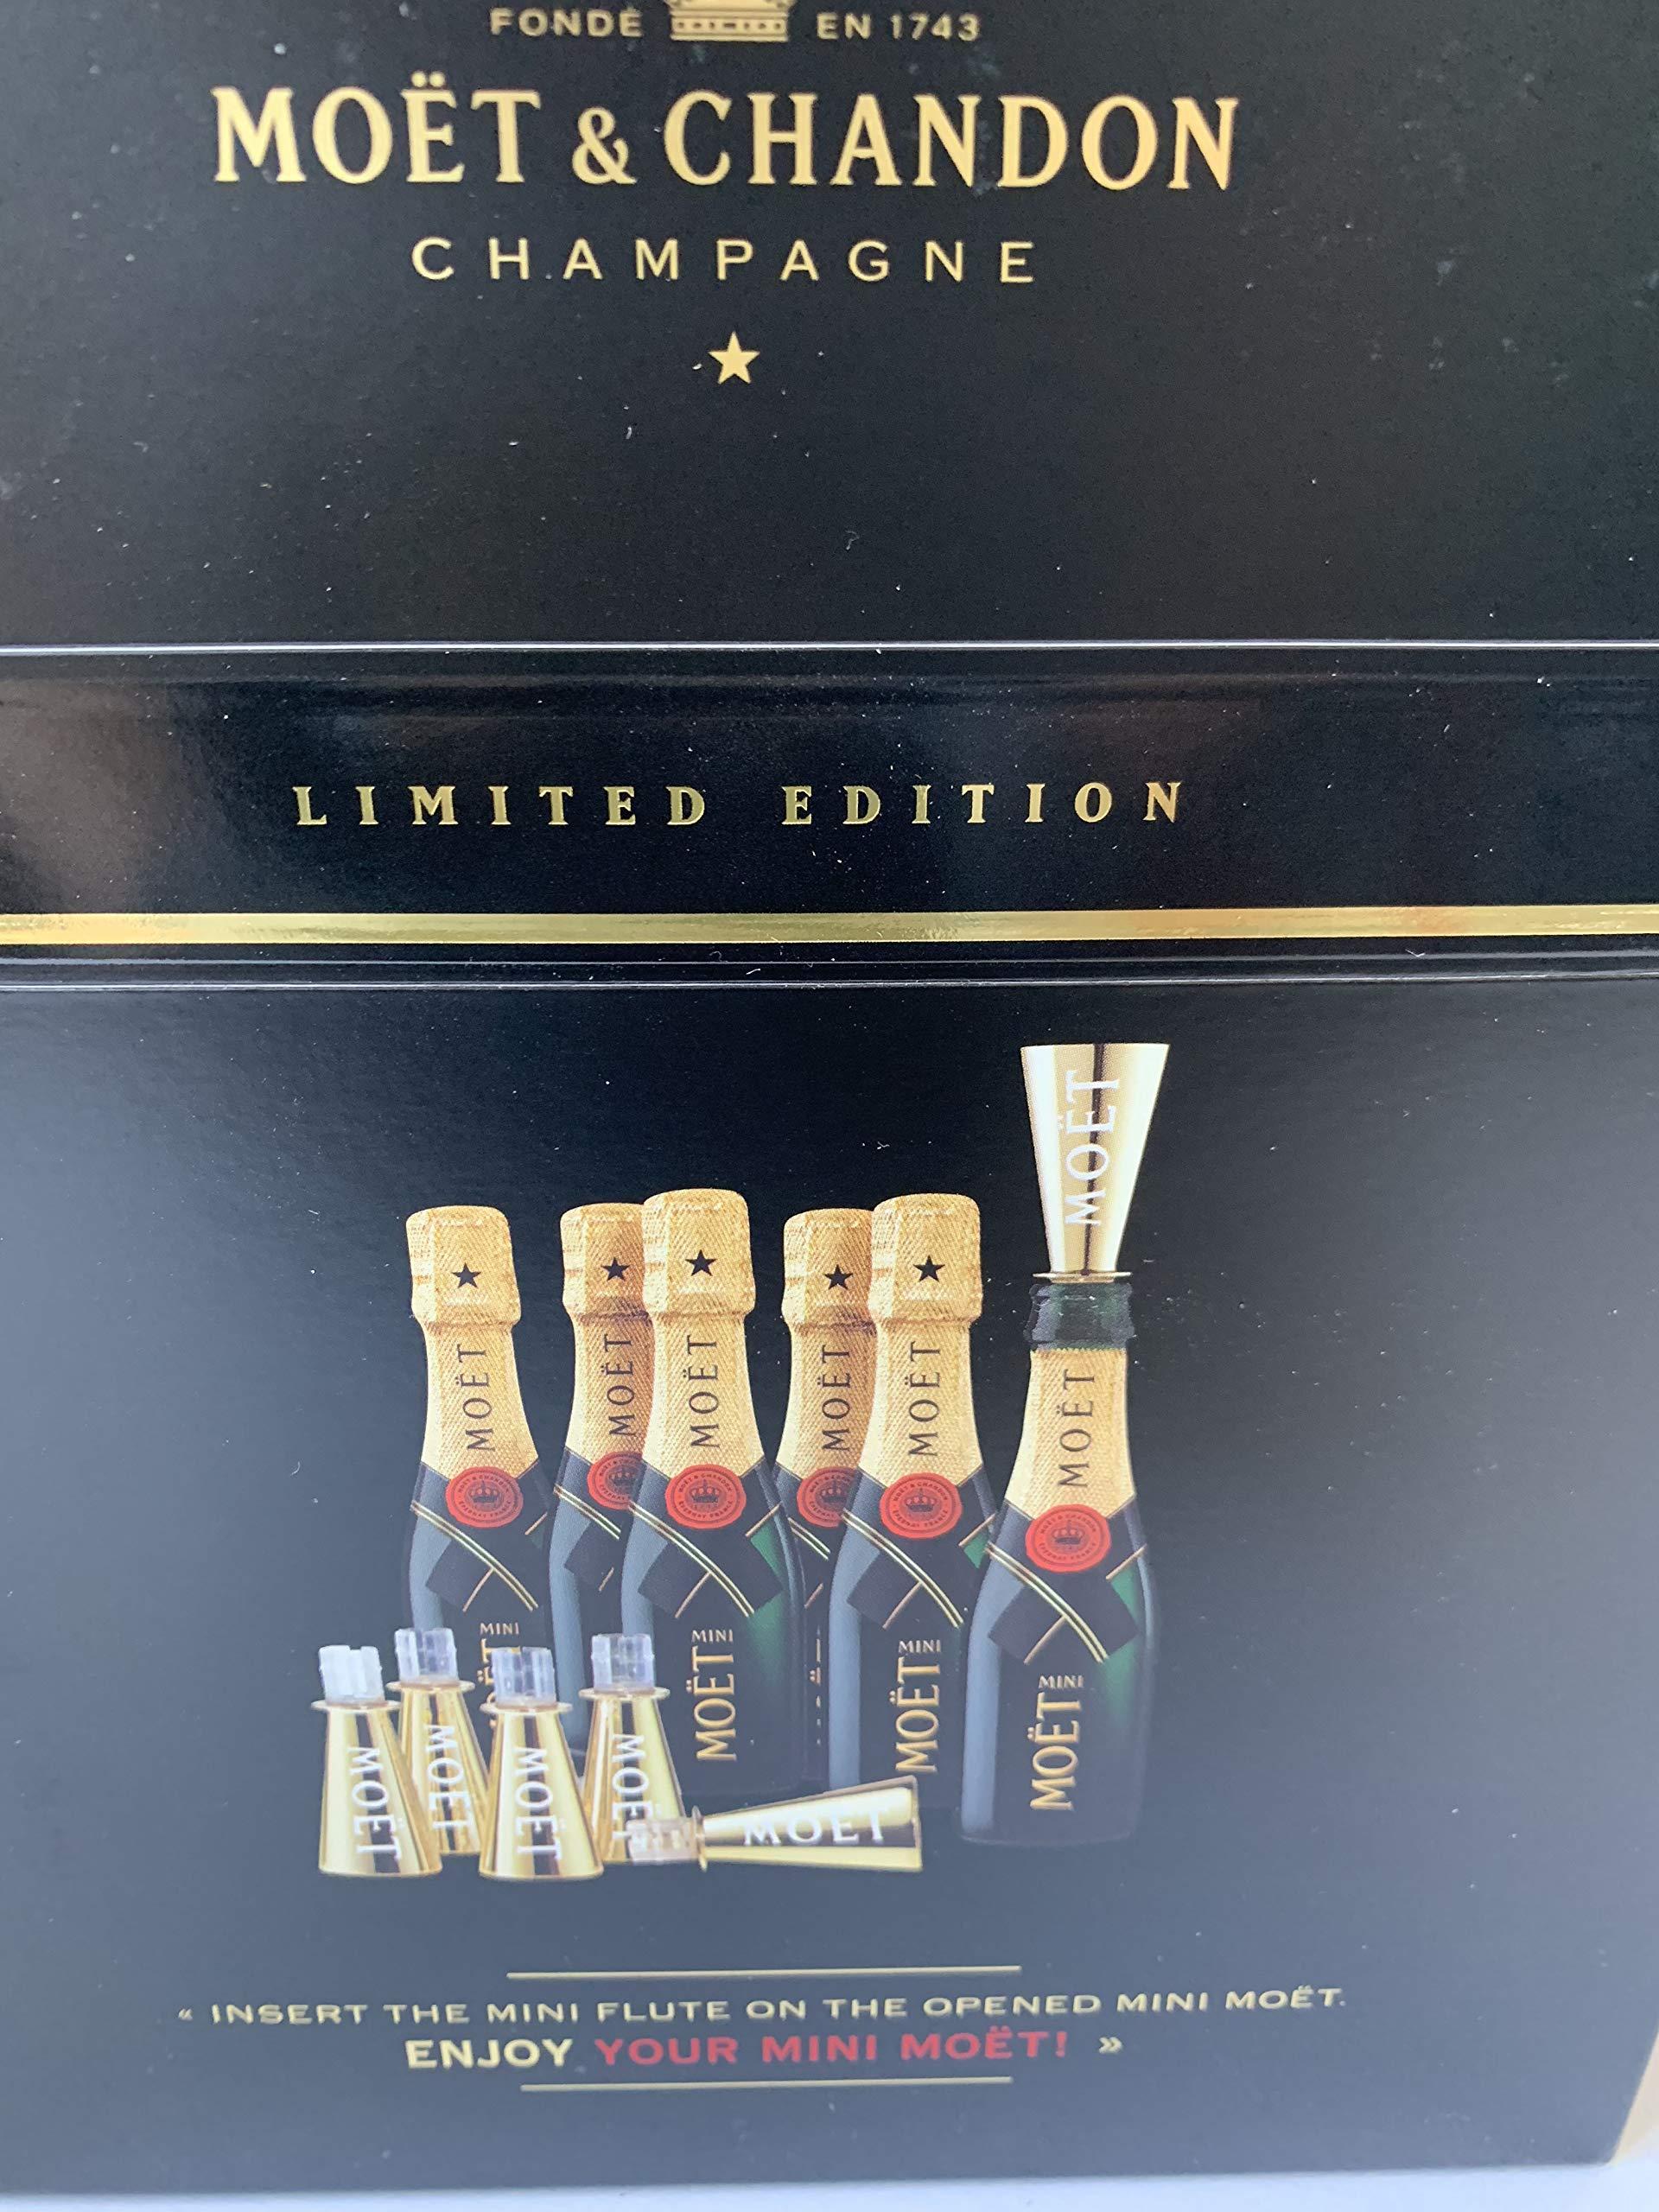 6x-Moet-Chandon-Brut-02l-Champagner-Piccolo-Flasche-inkl-6-Trinkaufstze-Six-Pack-12-Vol